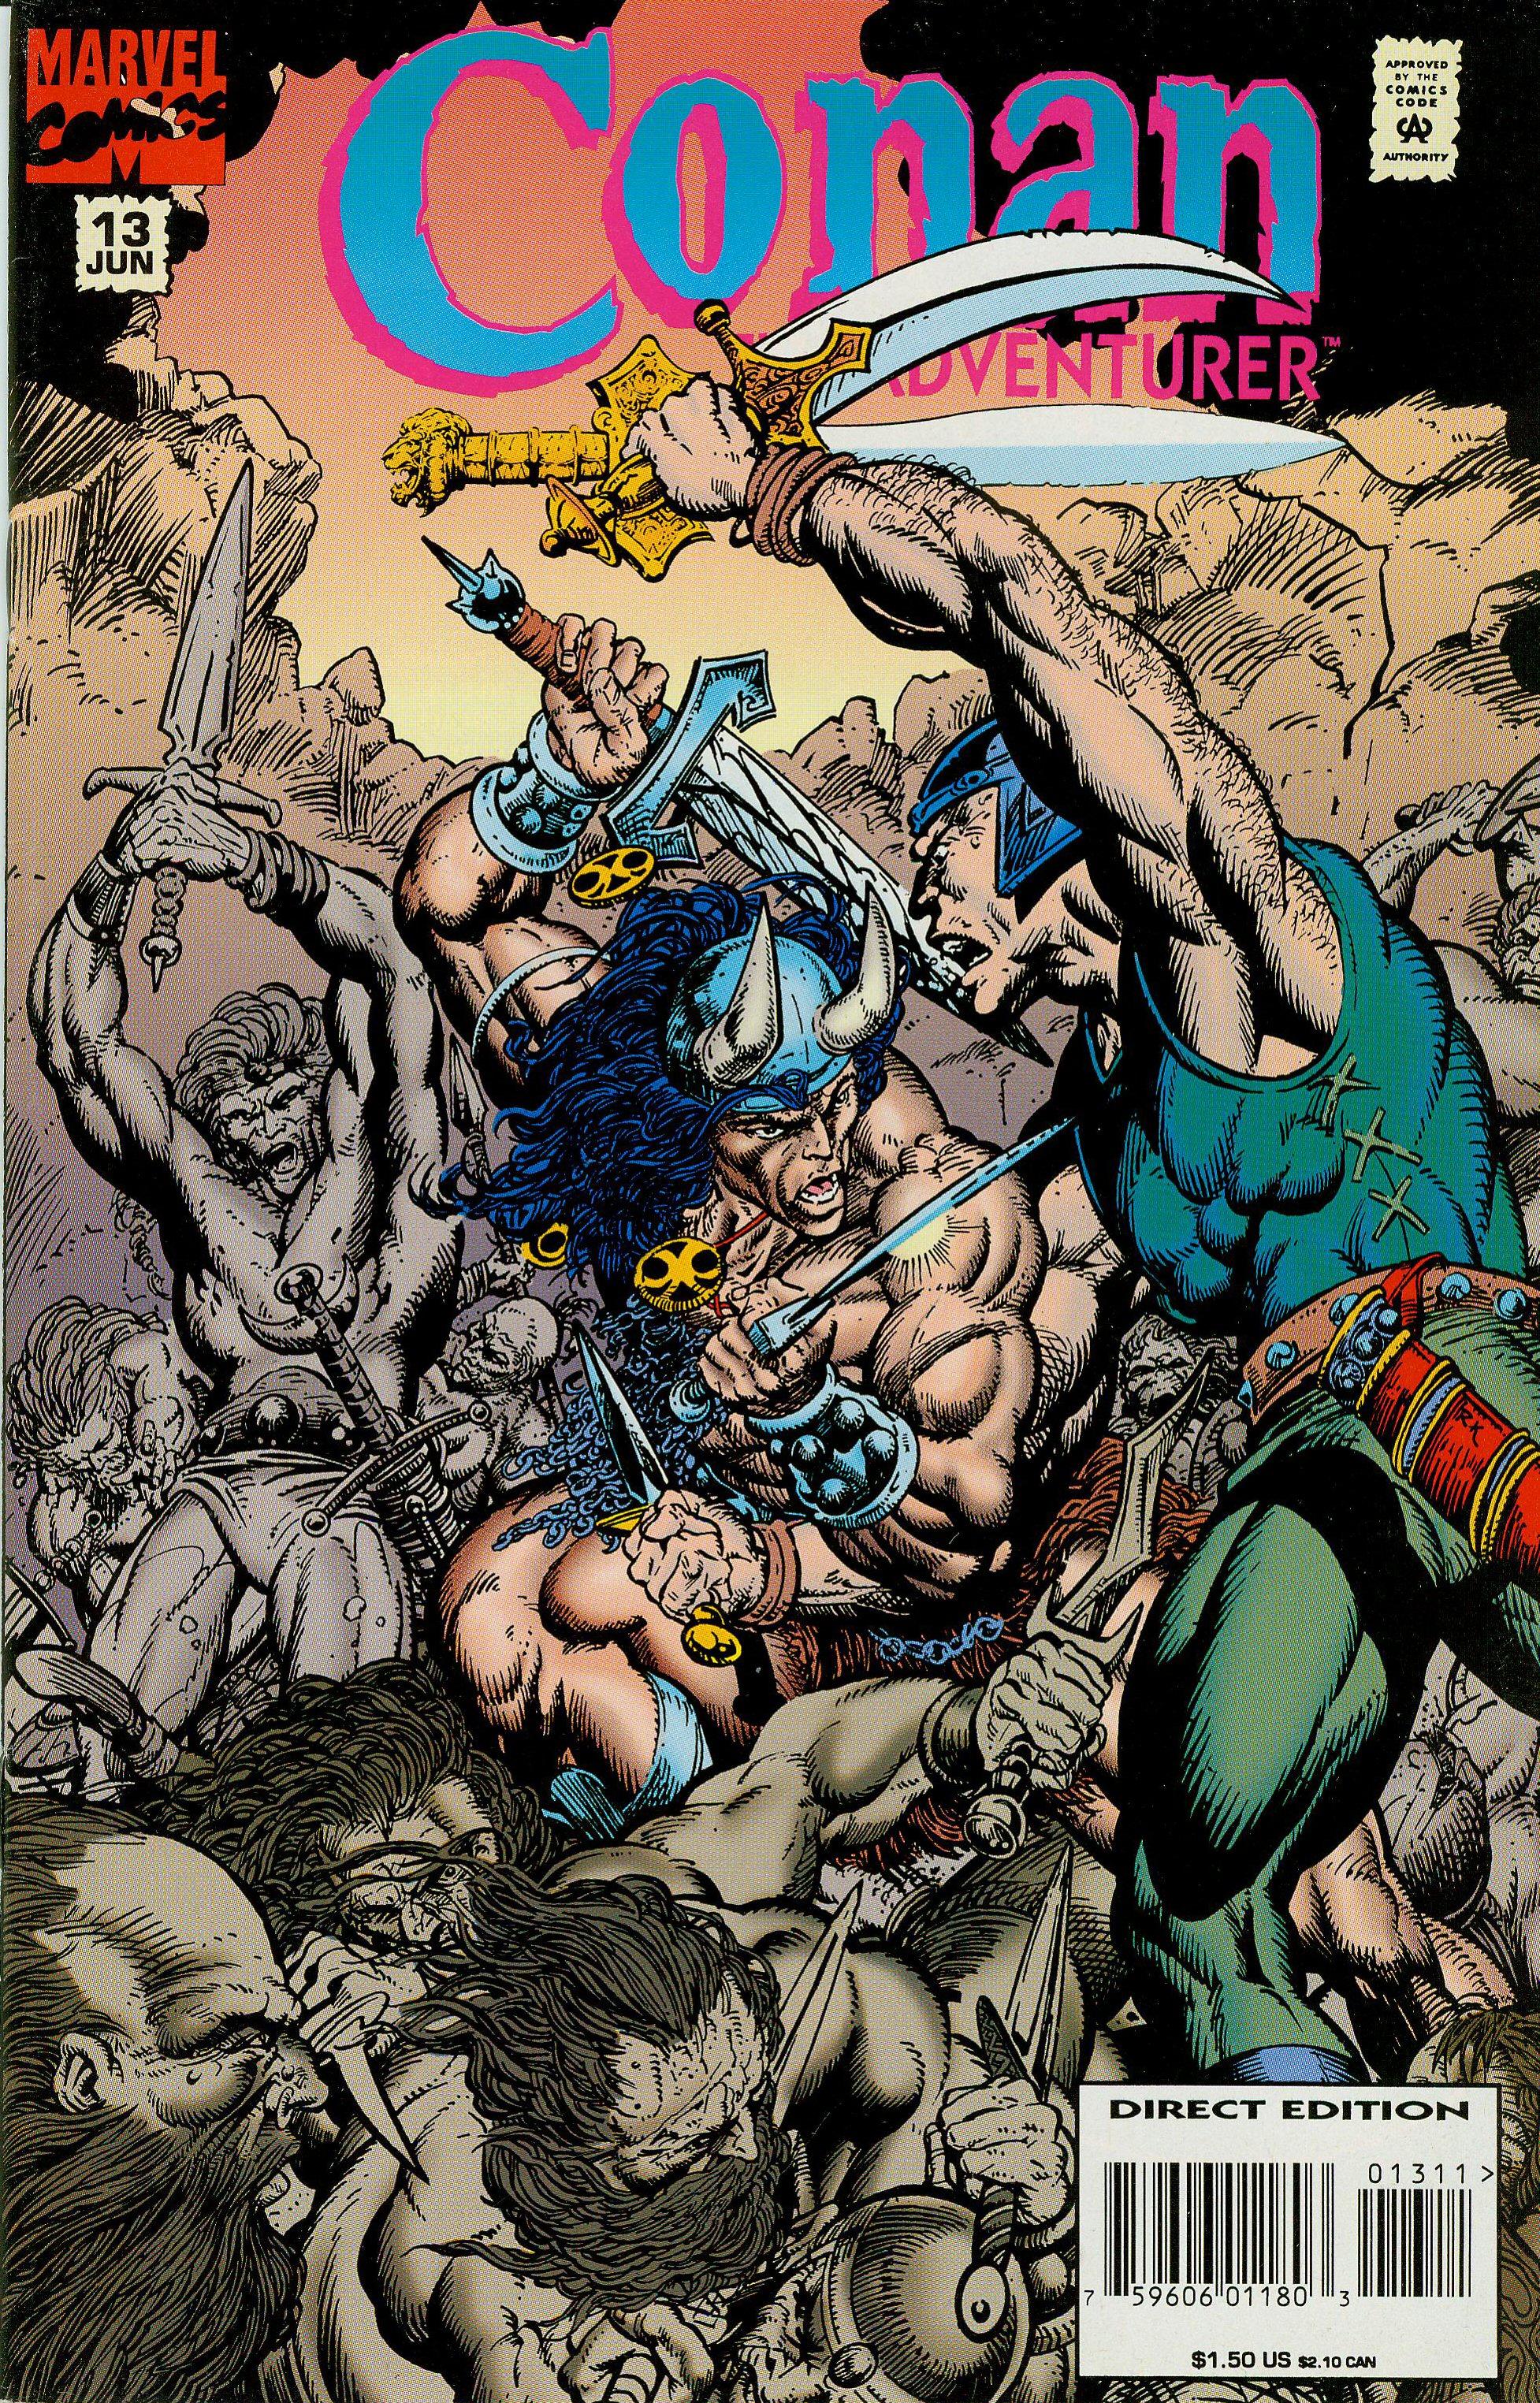 Read online Conan the Adventurer comic -  Issue #13 - 3